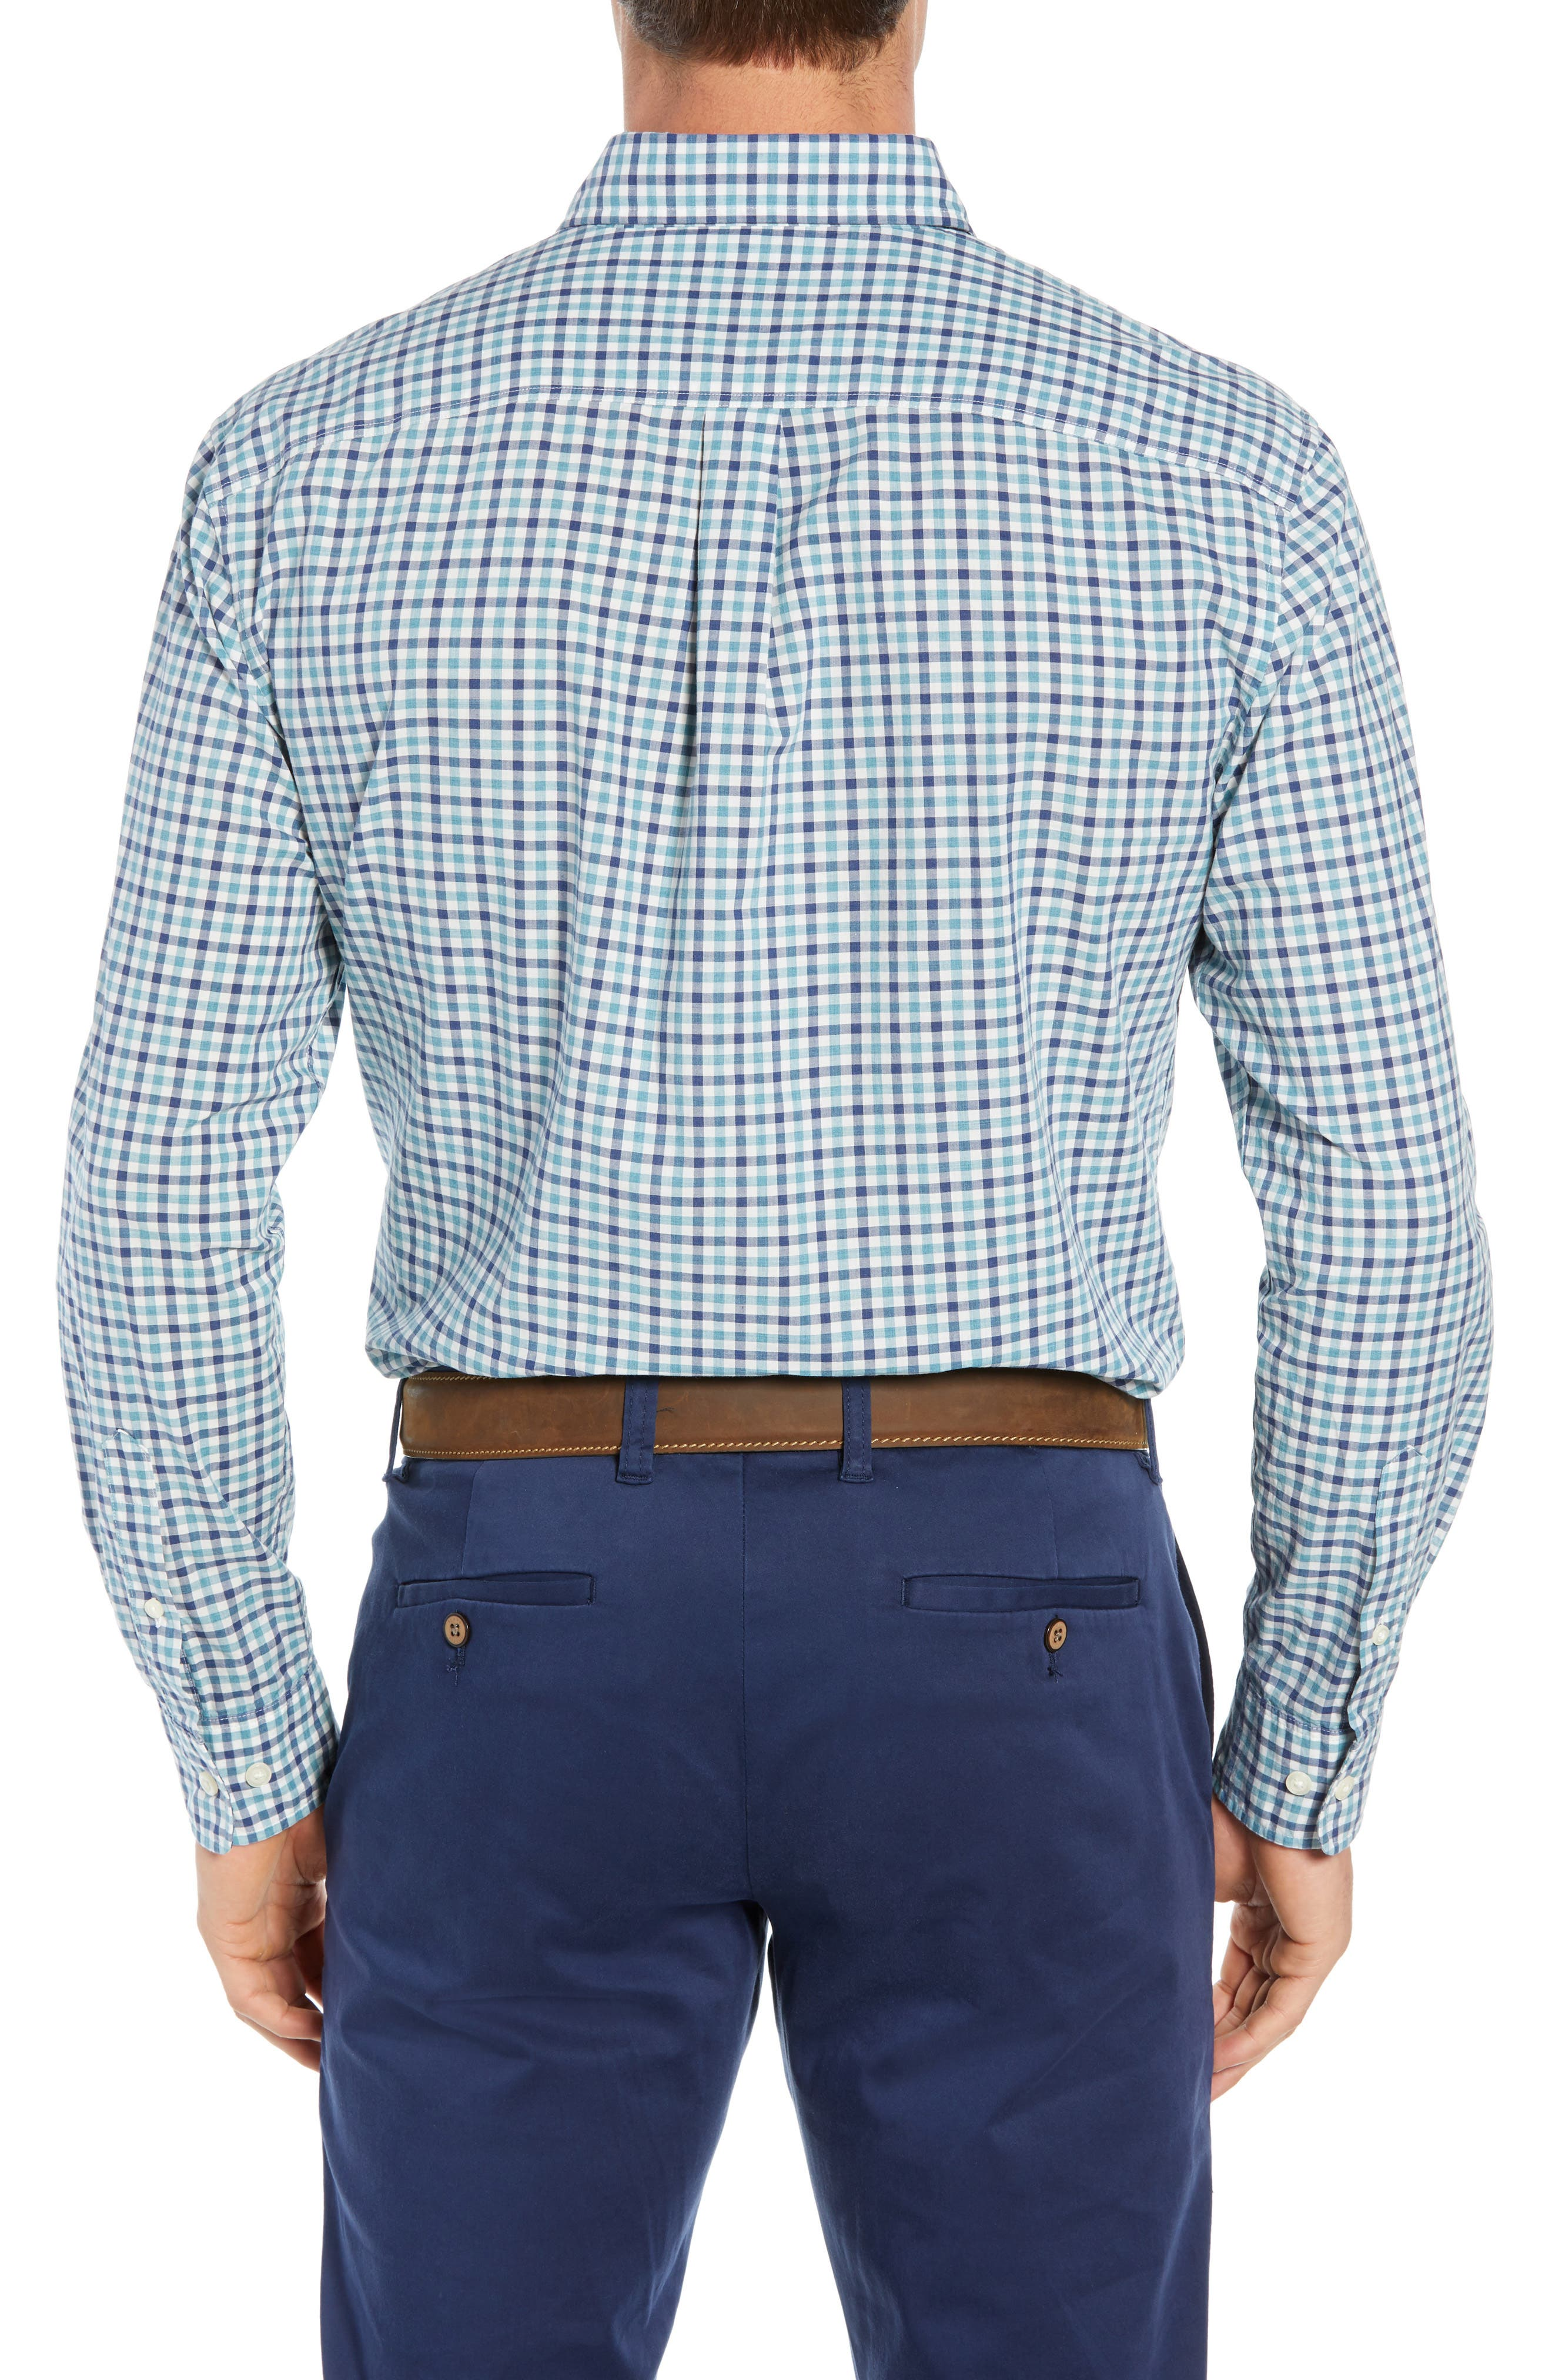 Finley Classic Fit Sport Shirt,                             Alternate thumbnail 3, color,                             JADE